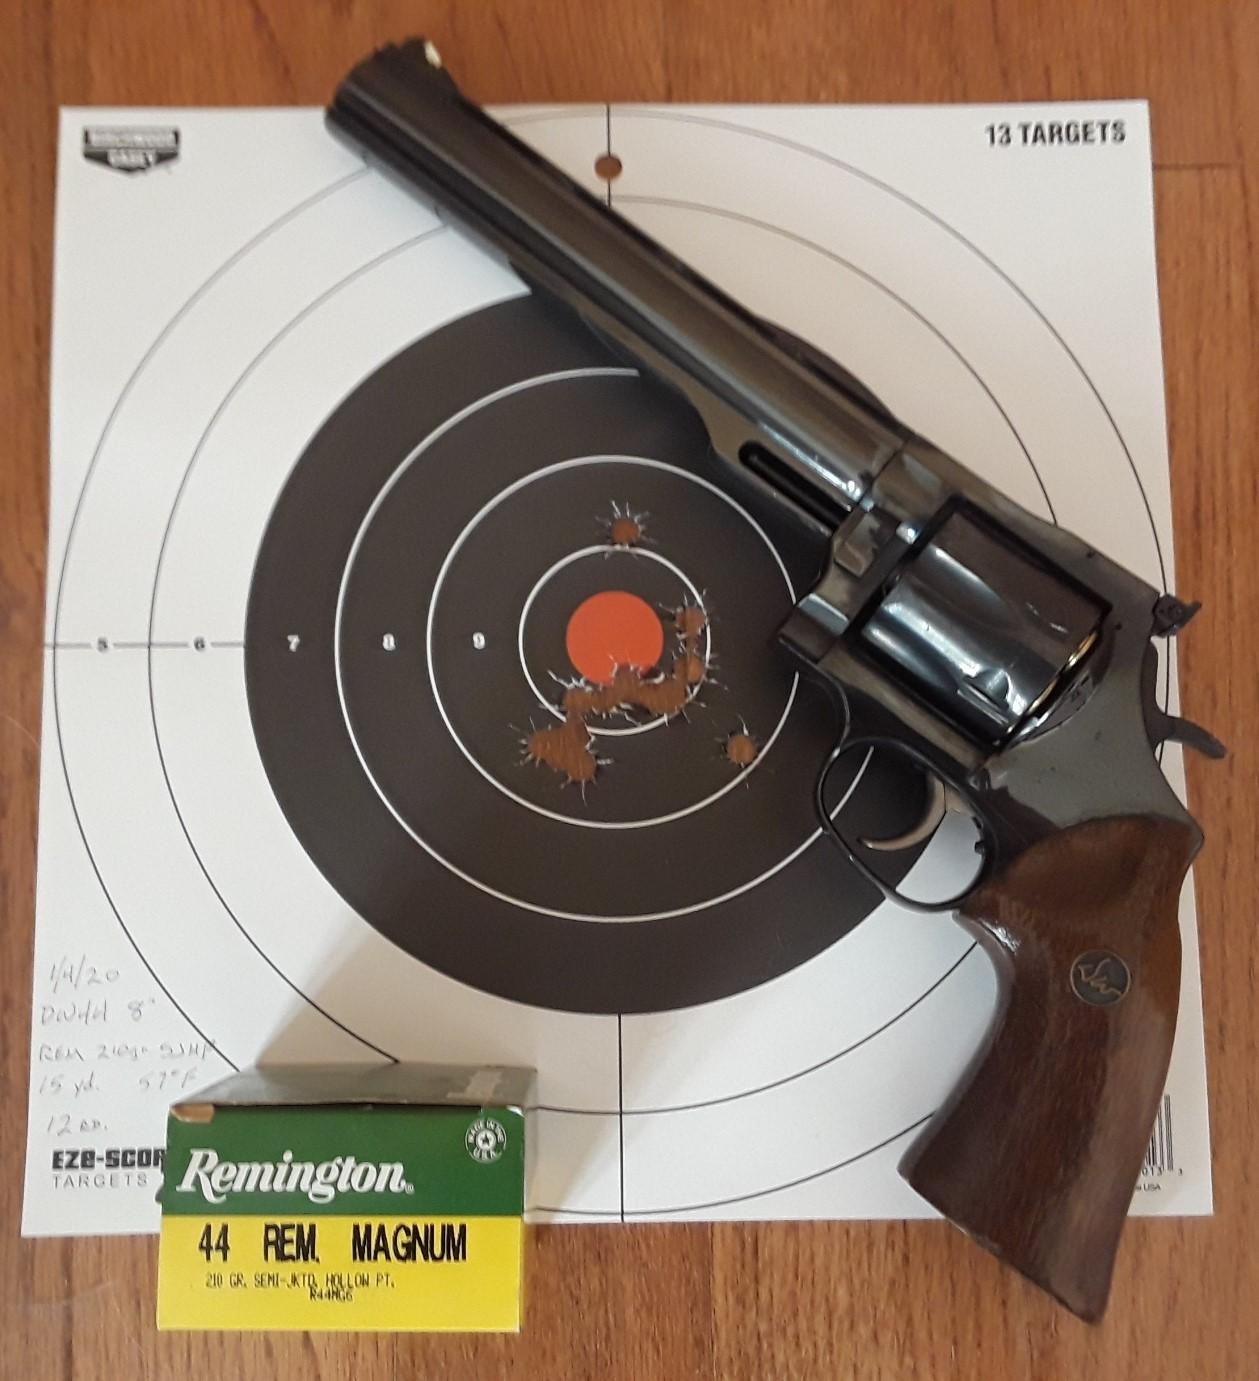 First Gun Fired in 2020-dw44-target-04jan20.jpg